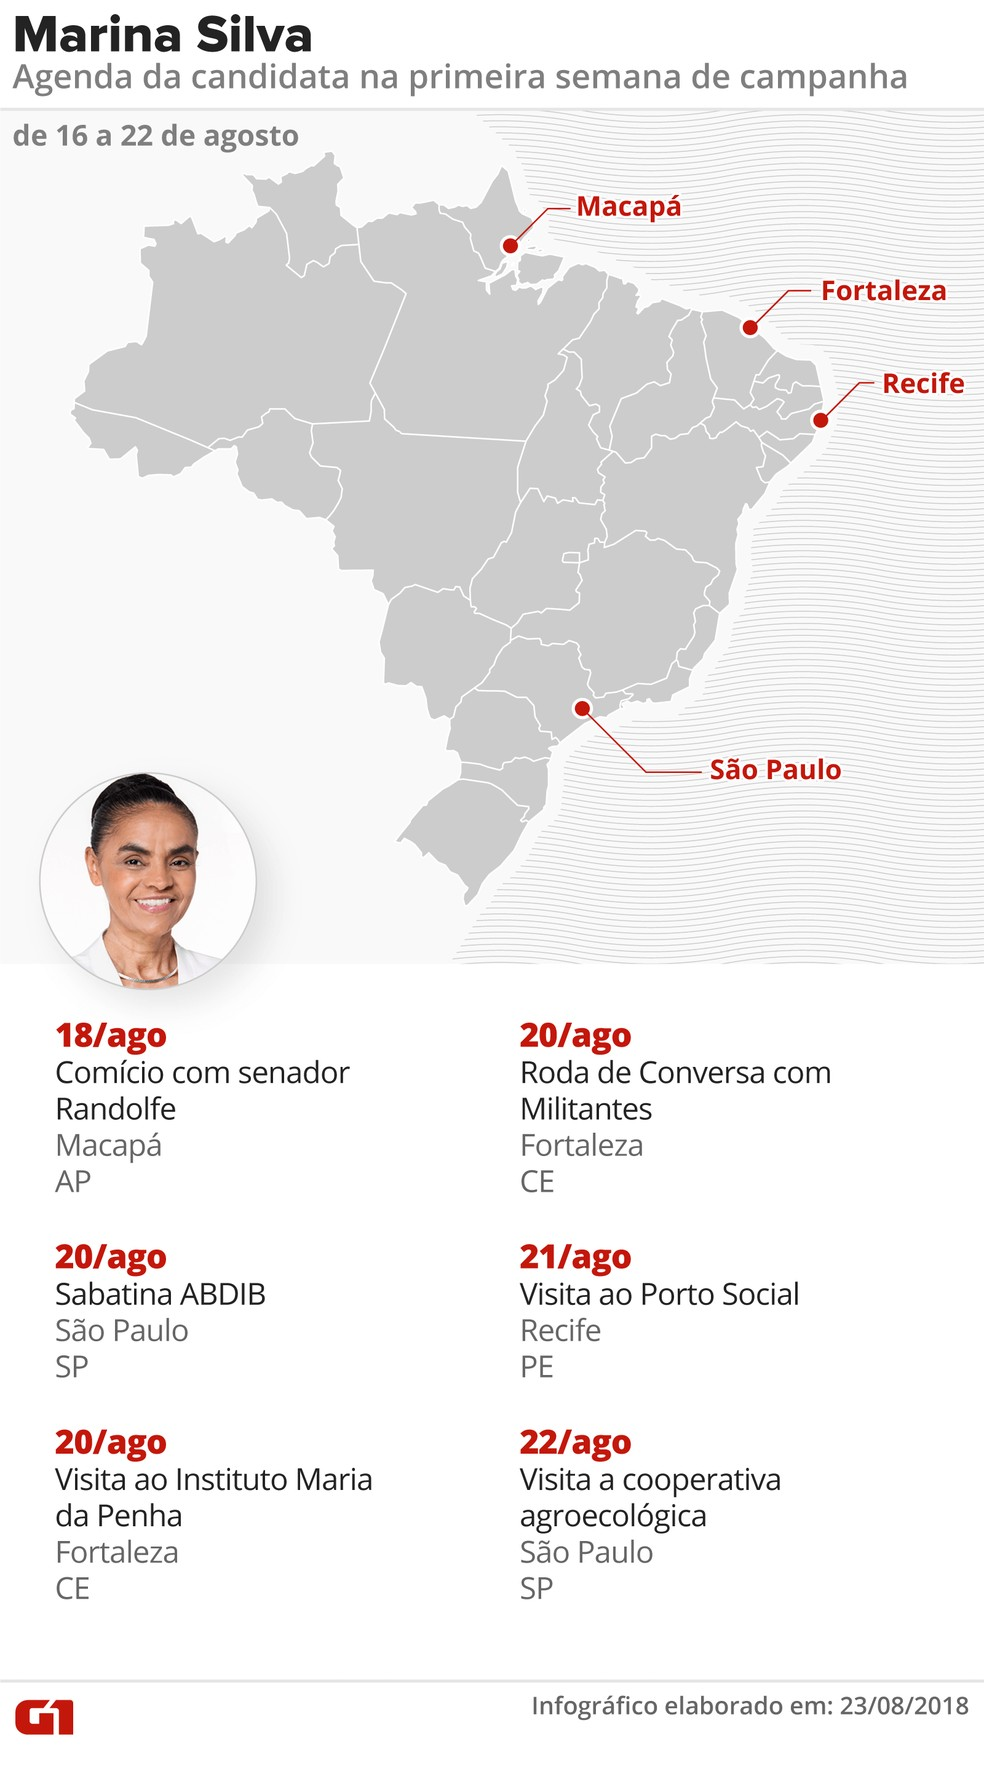 Agenda de Marina Silva (Rede) na primeira semana da campanha presidencial (Foto: Alexandre Mauro, Roberta Jaworski, Igor Estrella e Juliane Souza)